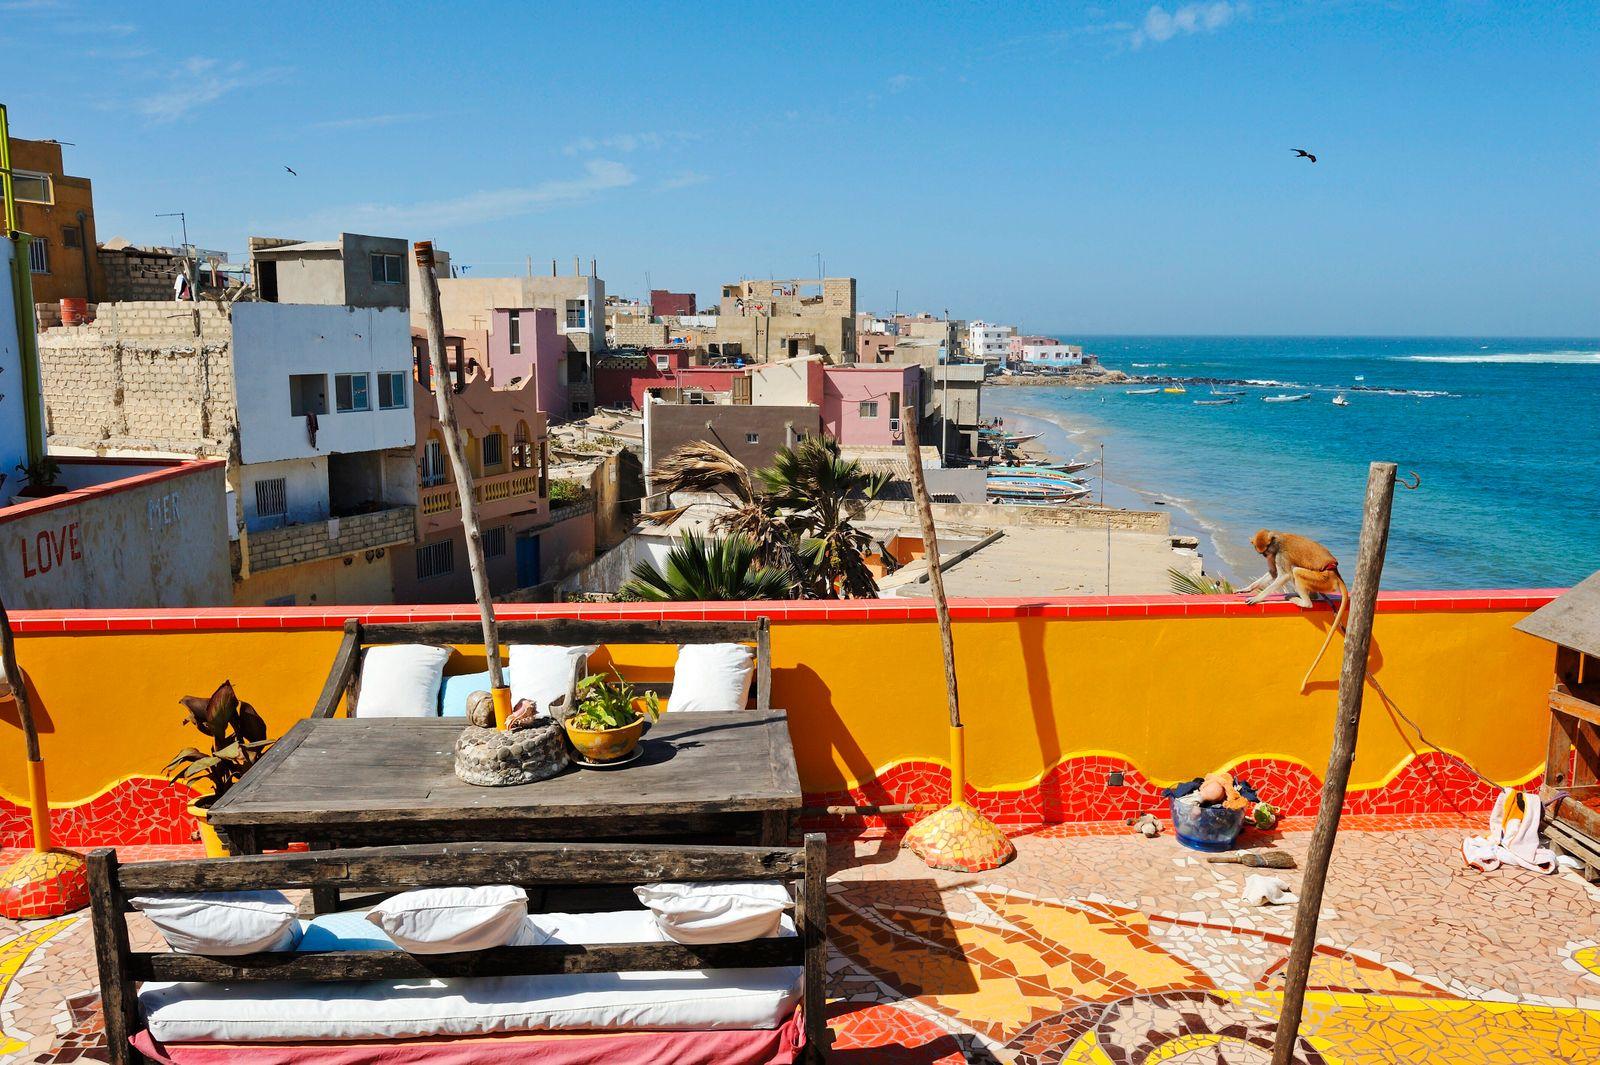 Abaka guesthouse, Ngor, Dakar, Senegal, West Africa. (Christian Goupi)